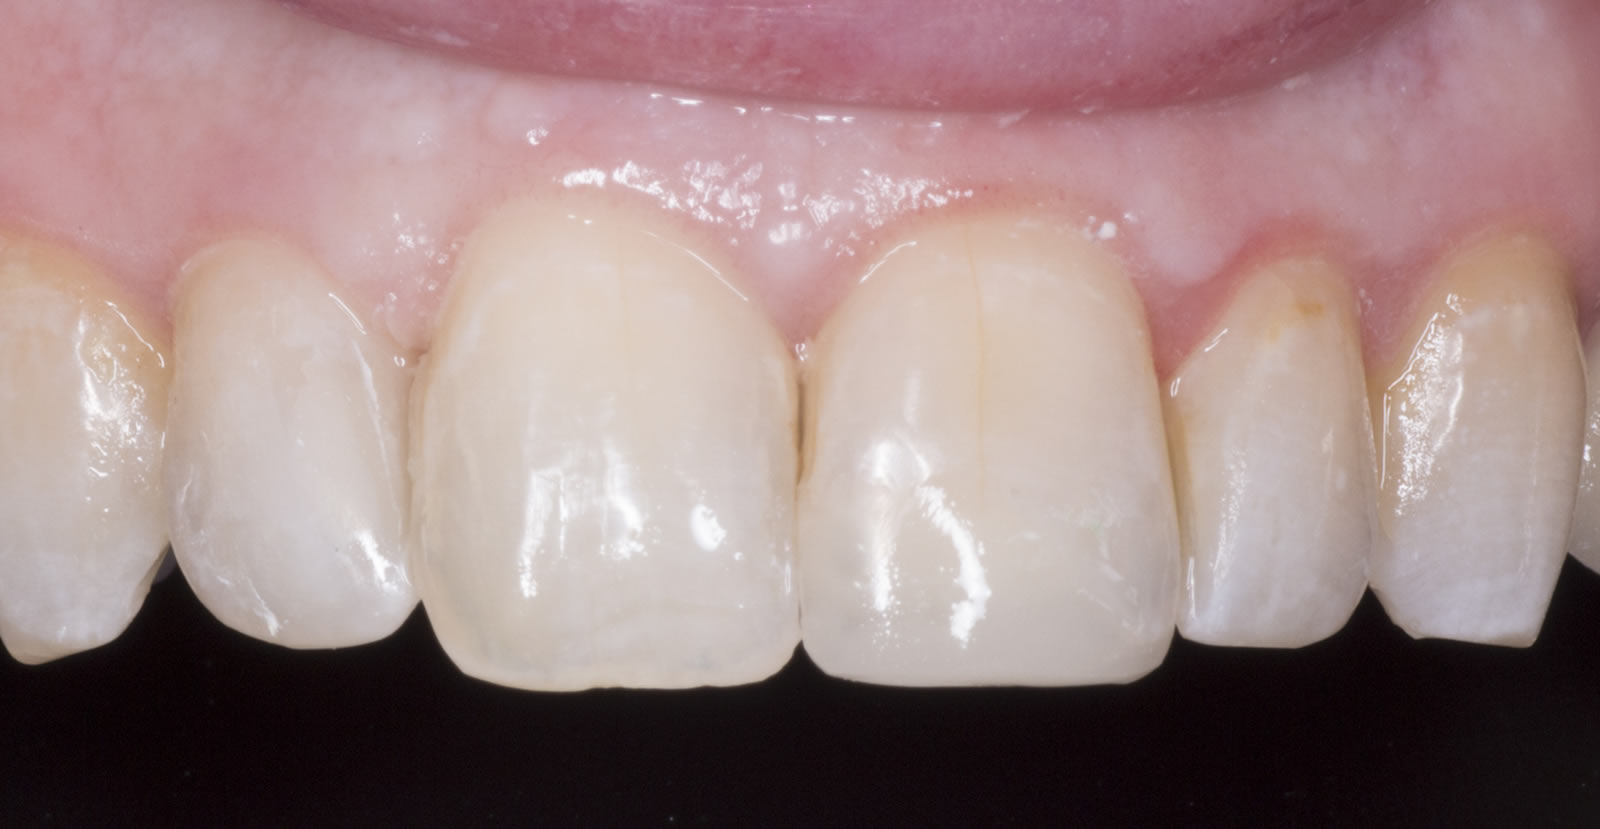 Botox in Donegal - Ardara Dental - Facial treatments and